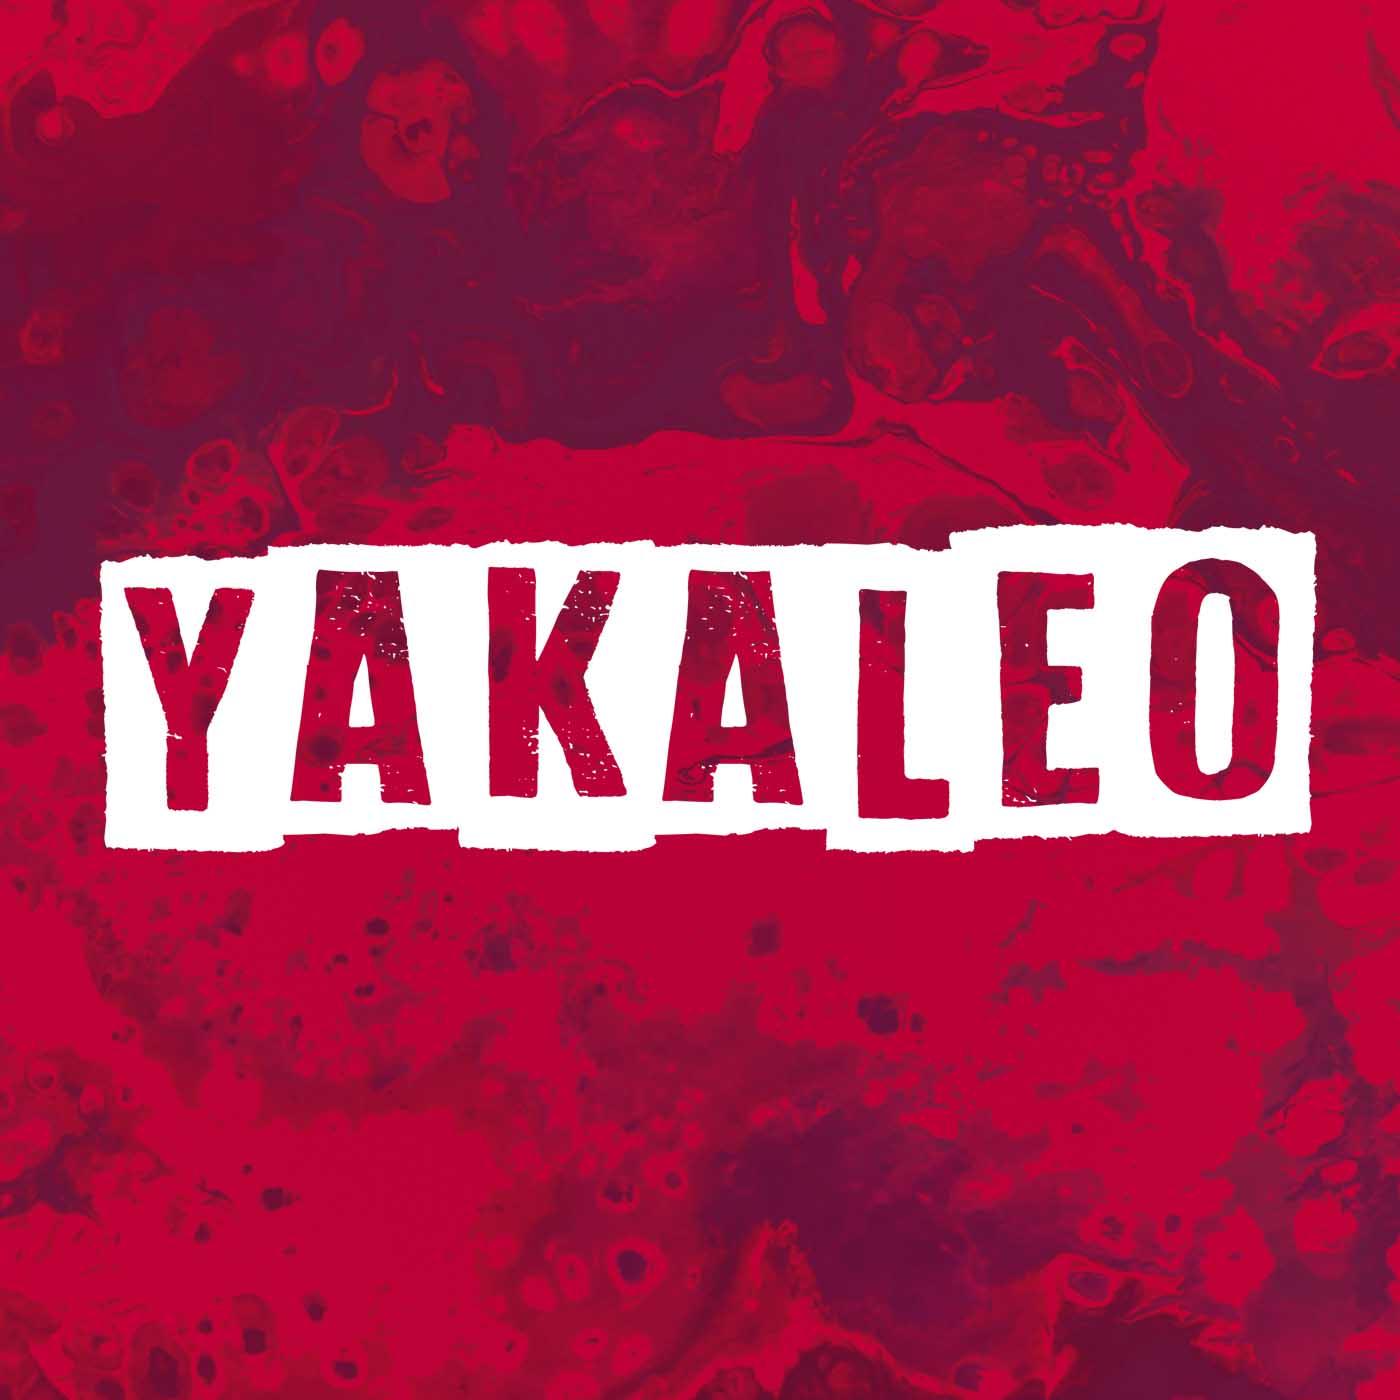 Yakaleo | #1 Reggaeton Exitos | 64k | www.yakaleo.com